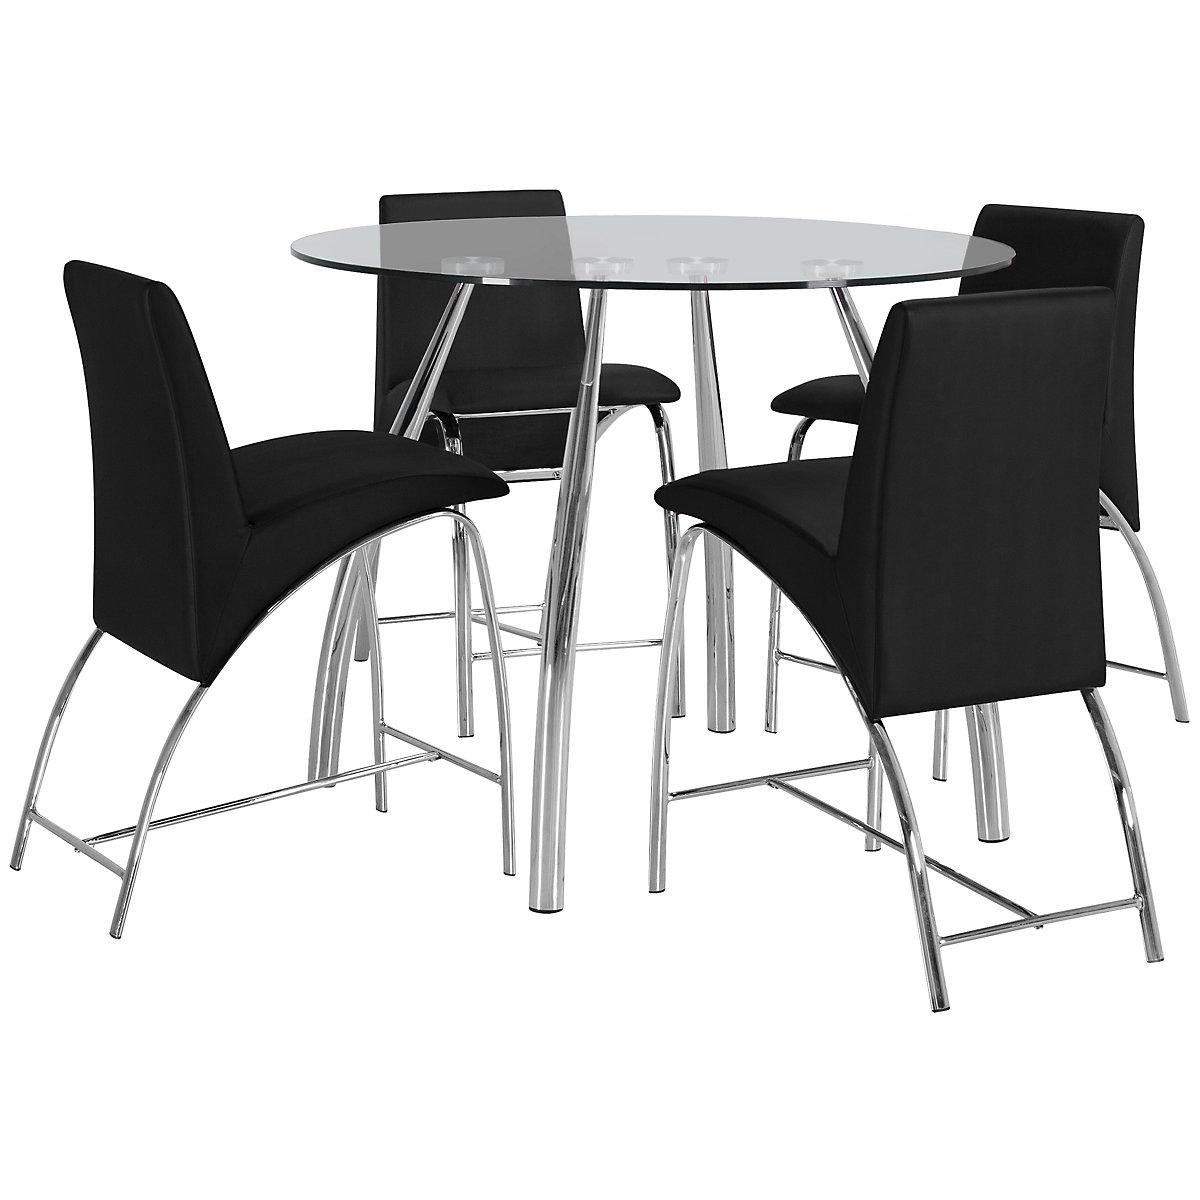 Mensa Black Round High Table & 4 Upholstered Barstools